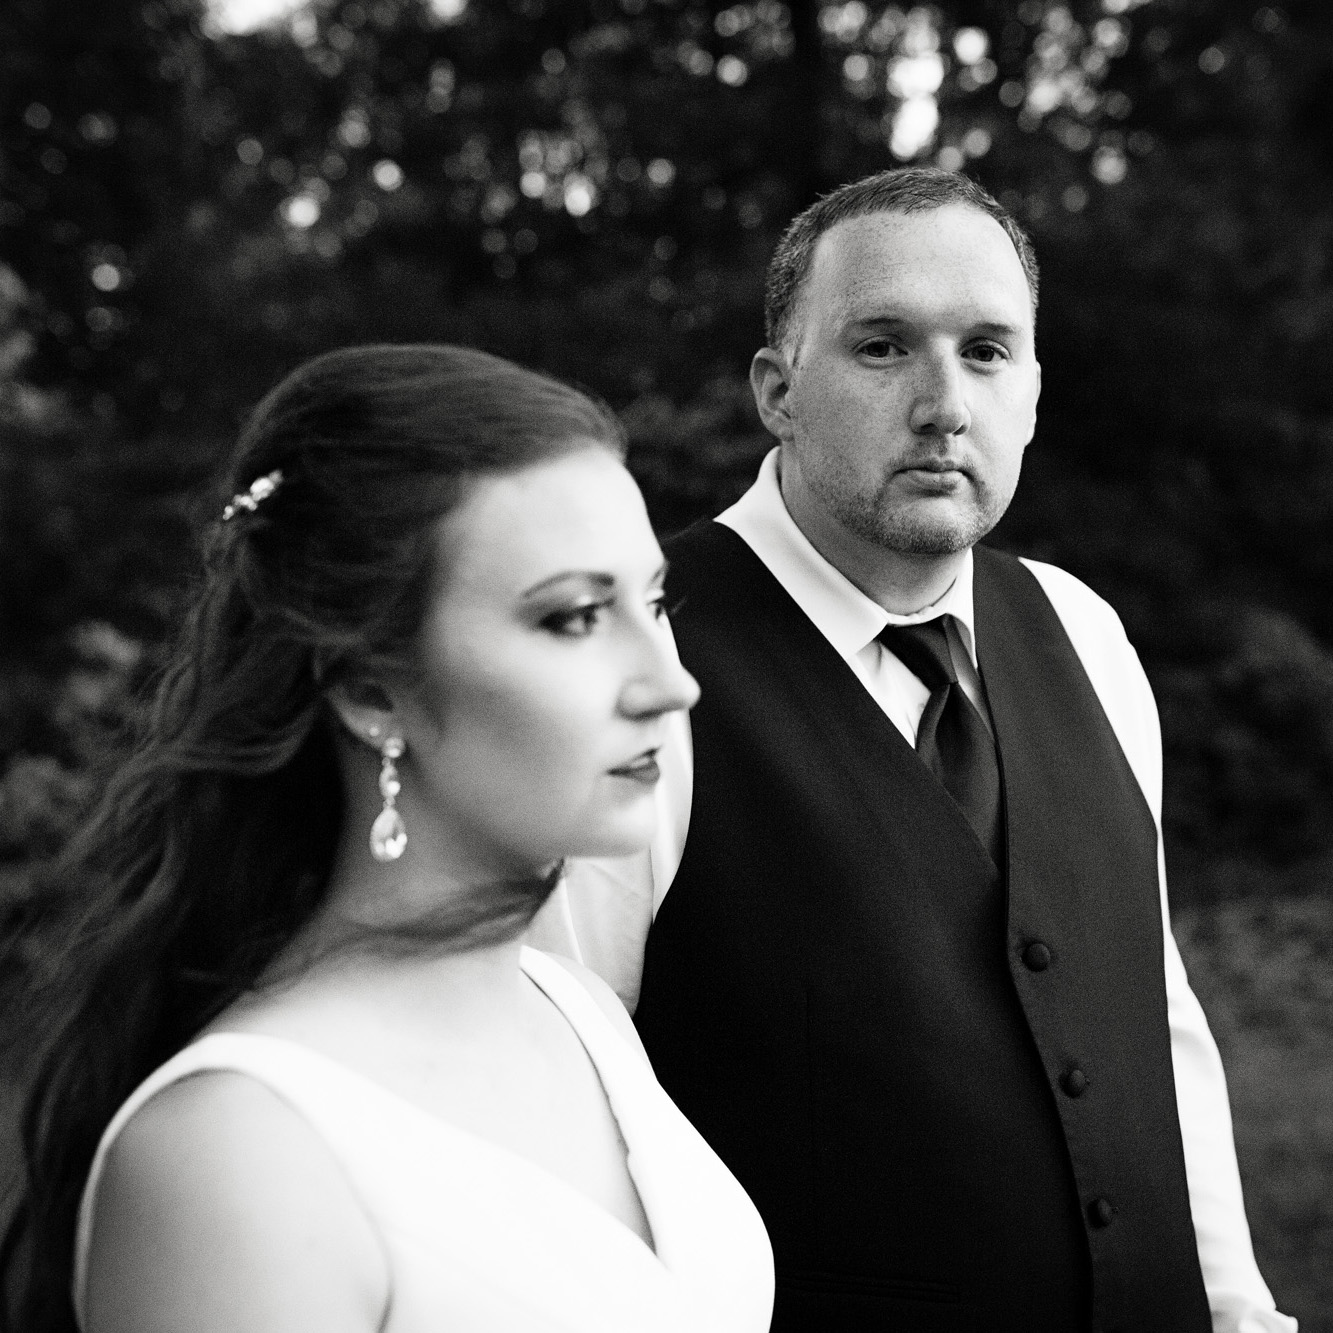 Seriously_Sabrina_Photography_Red_River_Gorge_Wedding_Barn_Robinson129.jpg